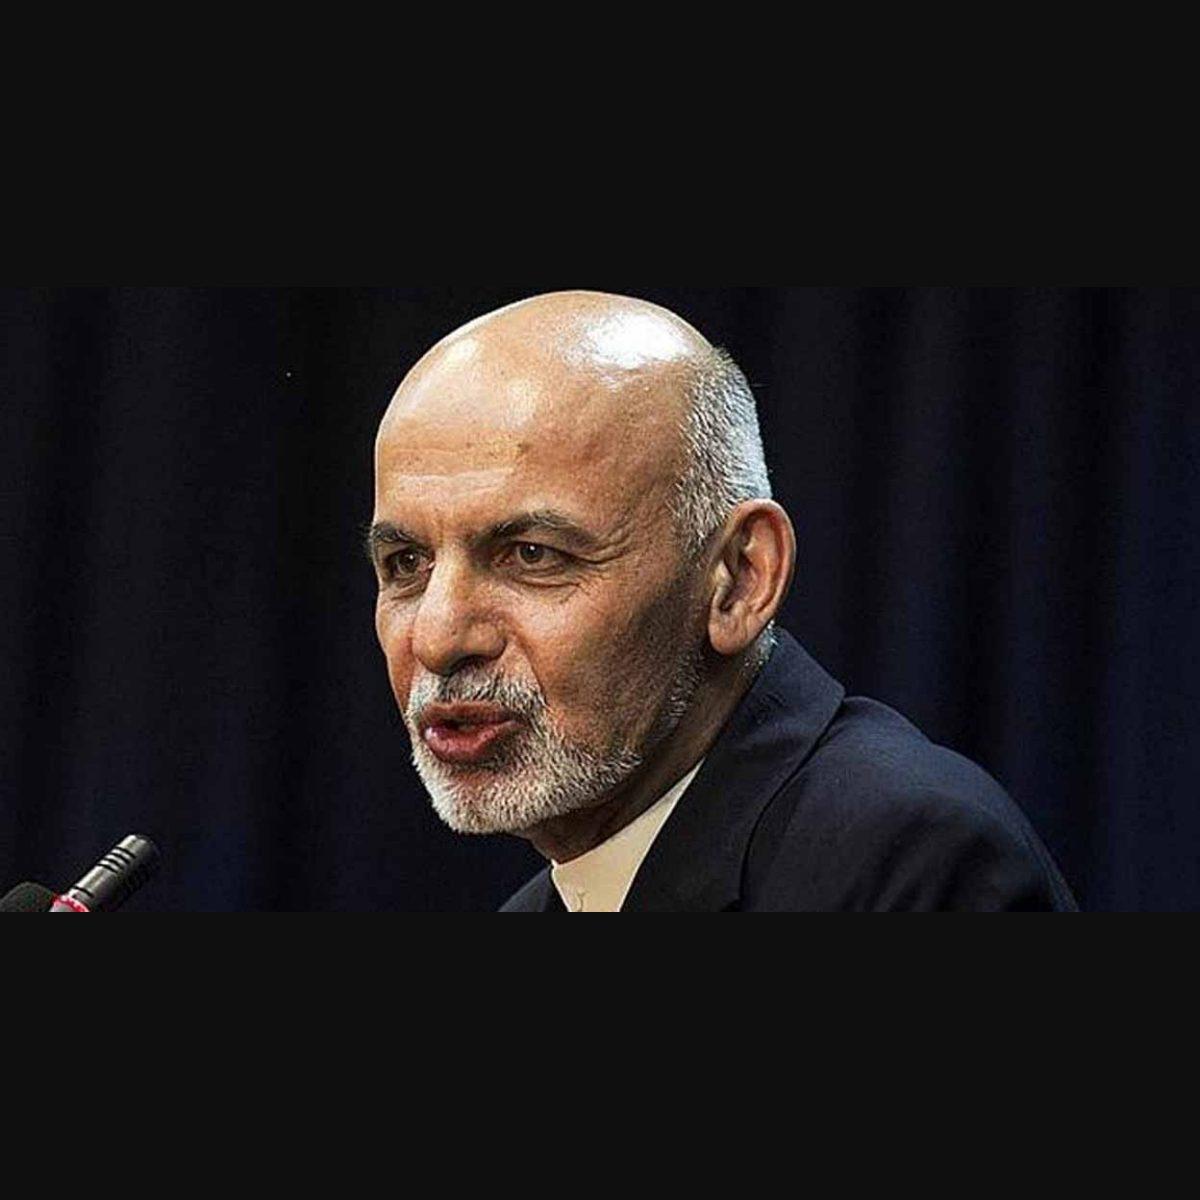 Afghan President Expresses Shock Over Killing Of Photojournalist Danish Siddiqui World News Onmanorama